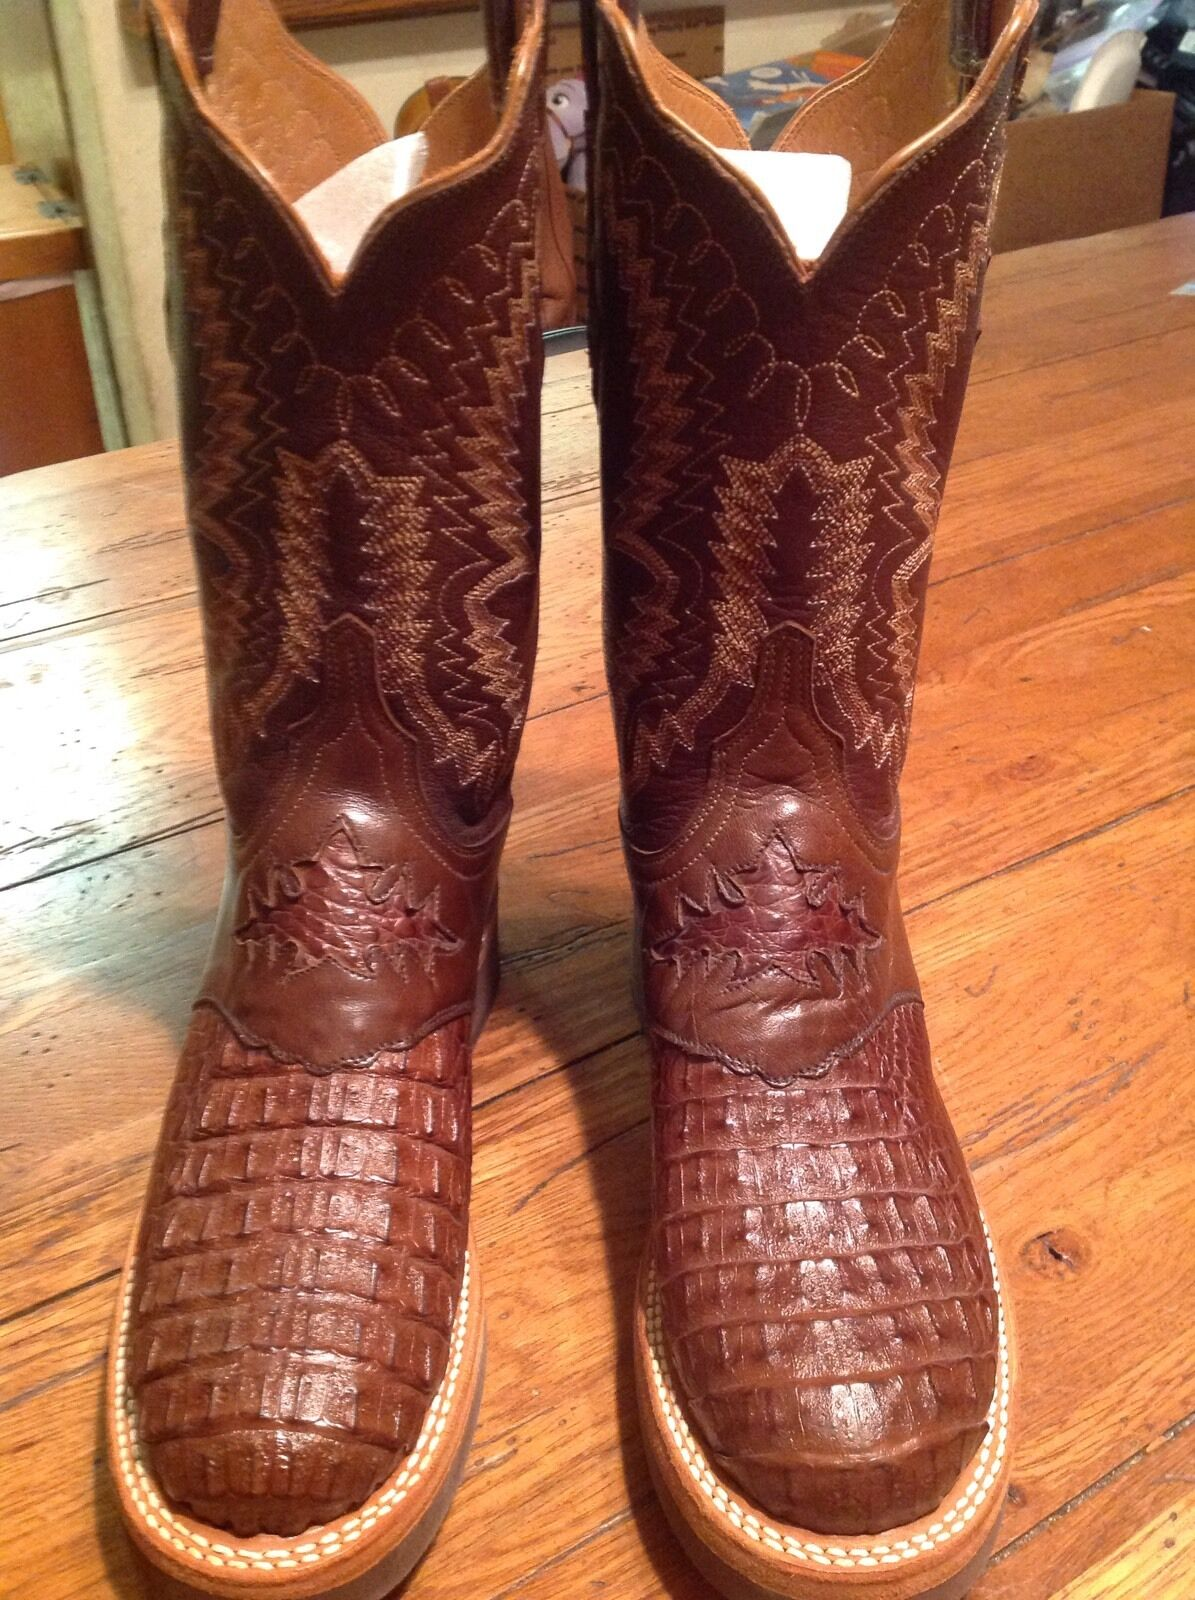 Bottes Lucchese tailcut Alligator Western bottes sz 7B, marron